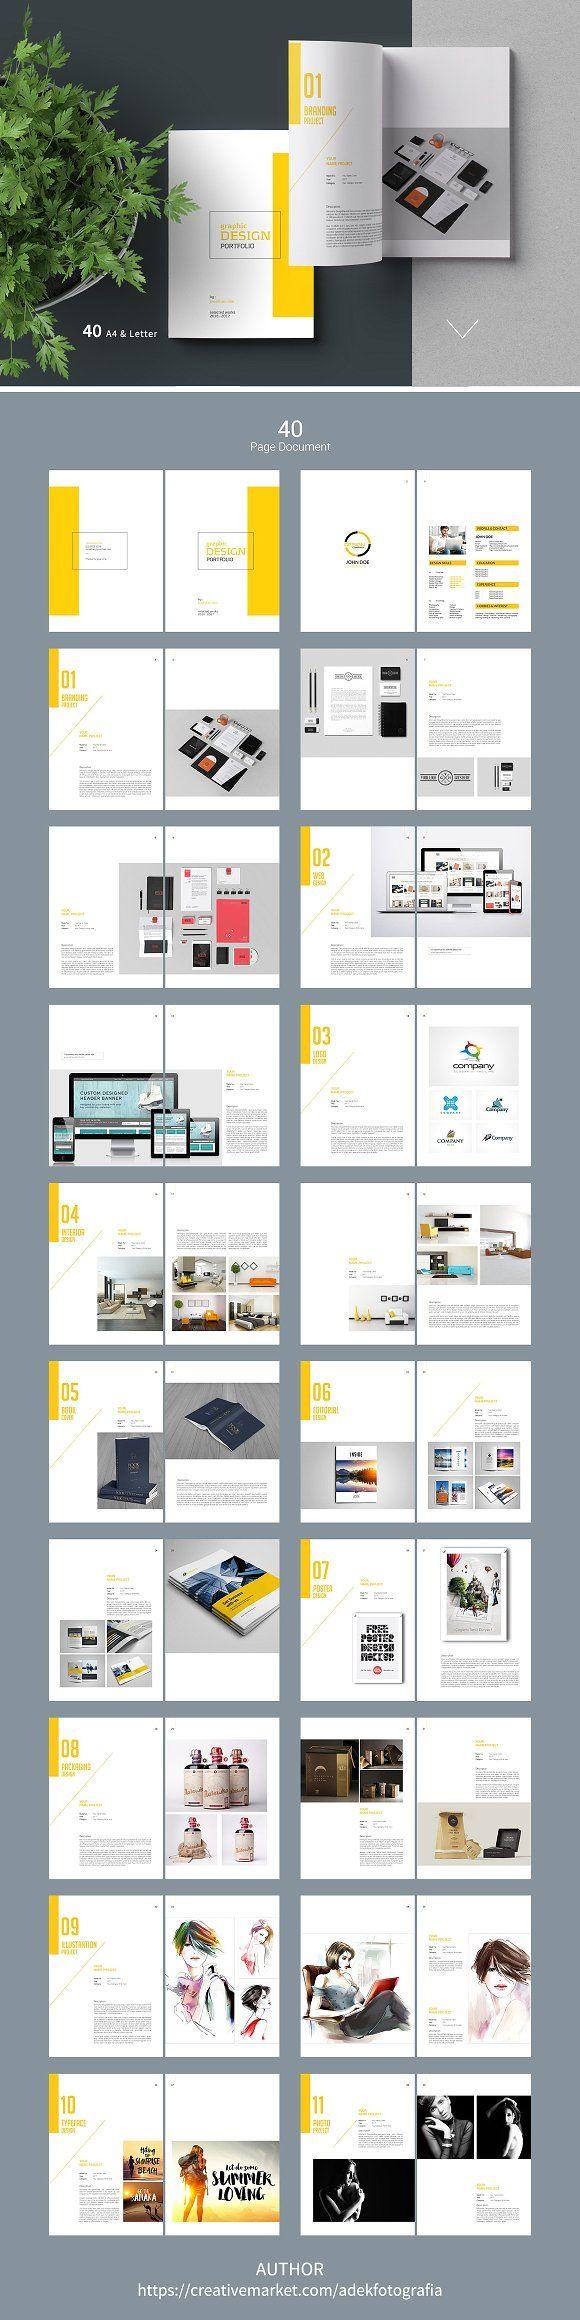 Graphic Design Portfolio Template by adekfotografia on @creativemarket